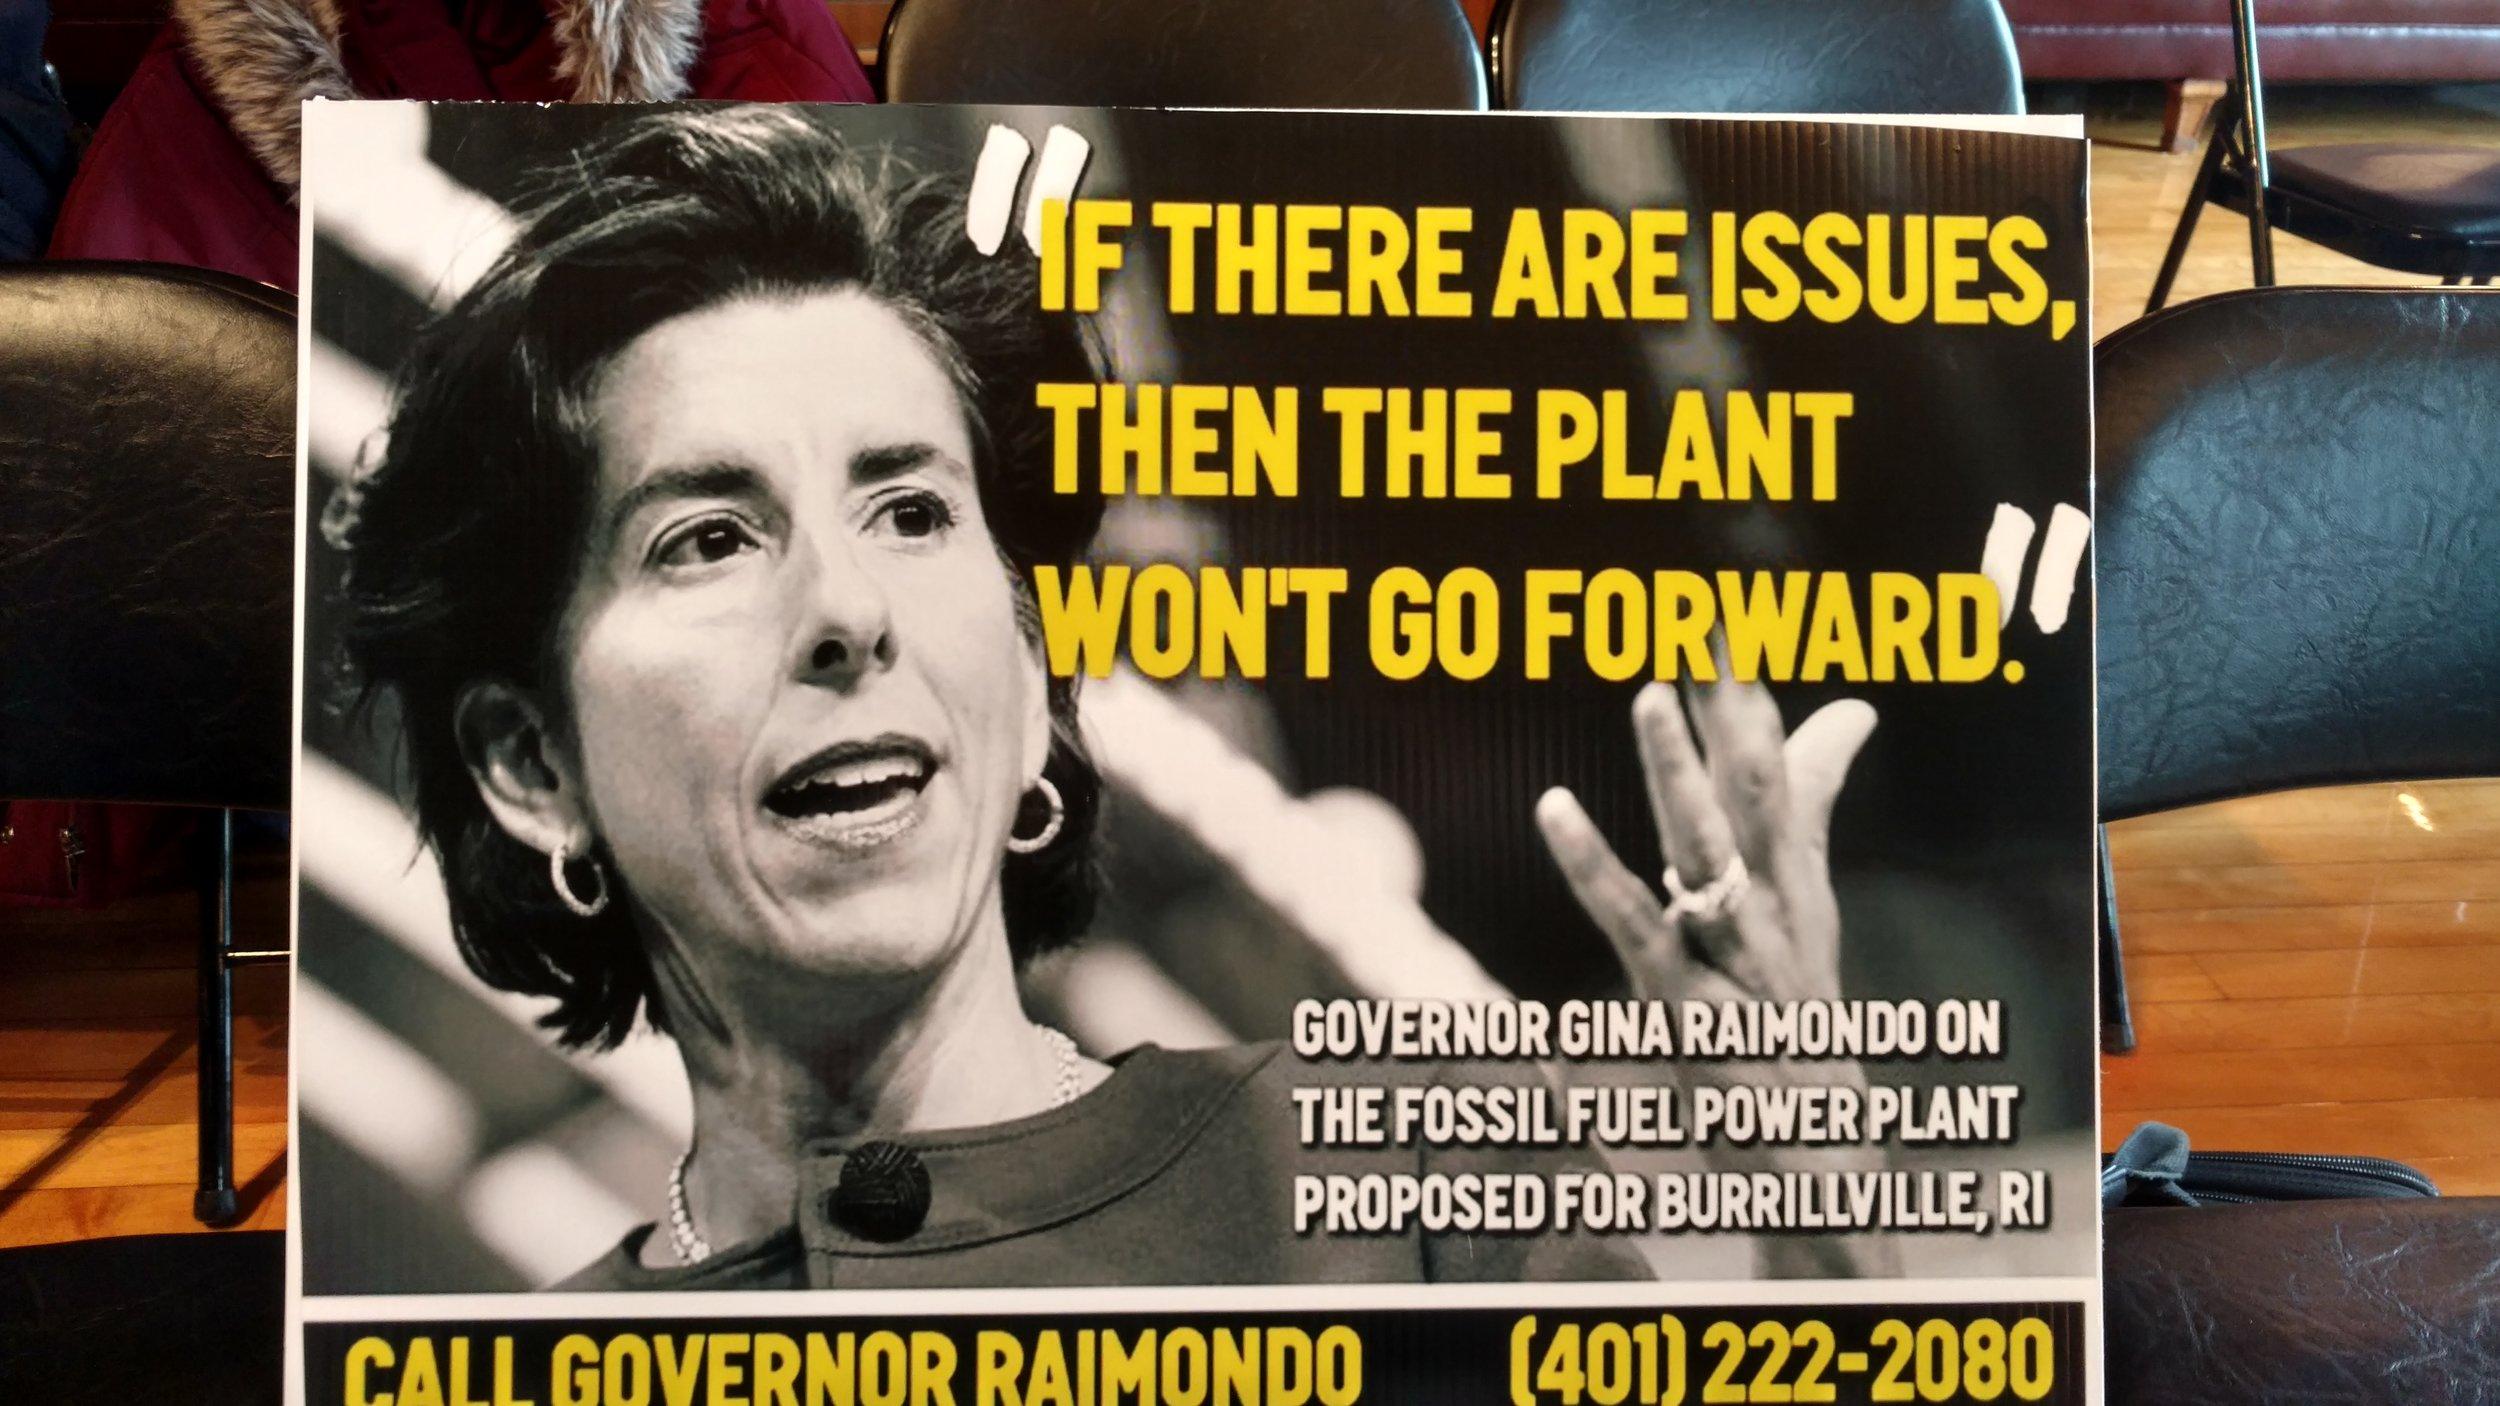 Prominent environmental groups are urging Gov. Gina Raimondo to oppose the proposed Burrillville power plant. (Tim Faulkner/ecoRI News)